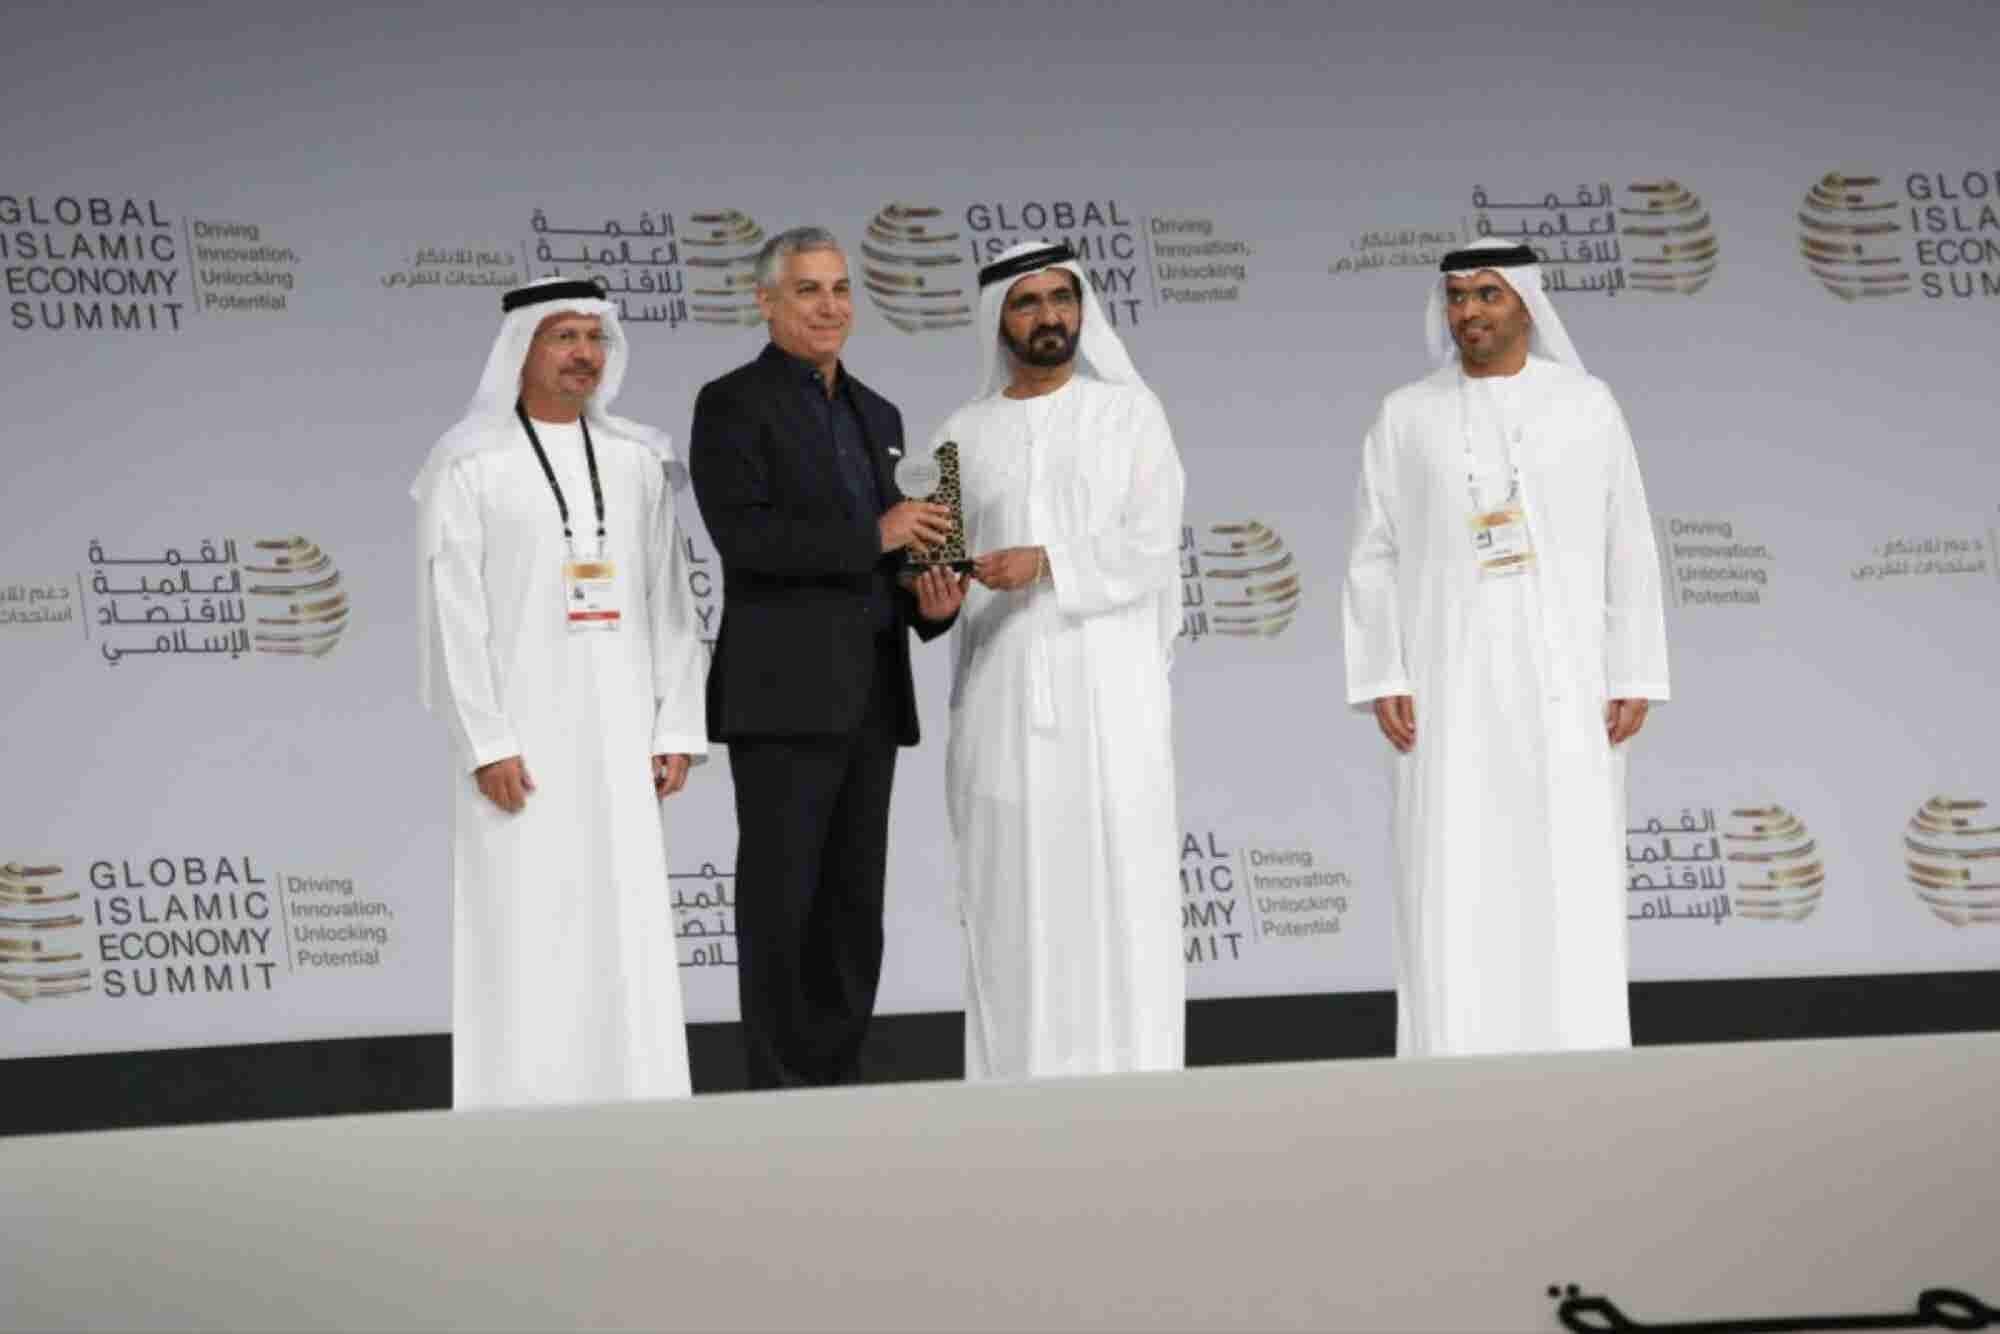 Global Islamic Economy Summit 2016 To Focus On Future Of Islamic Econo...